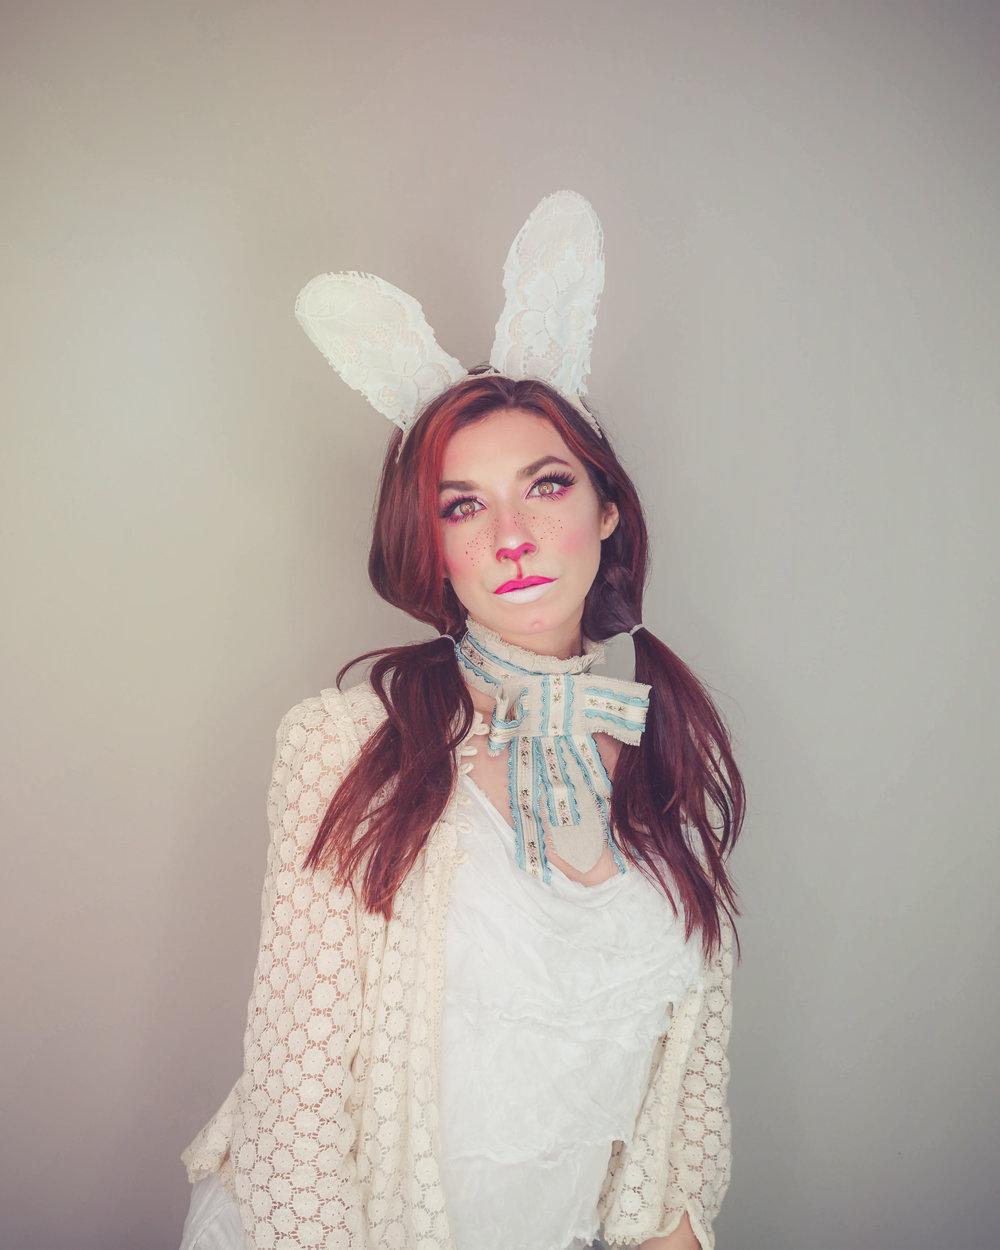 Victorian Bunny - An Original Design